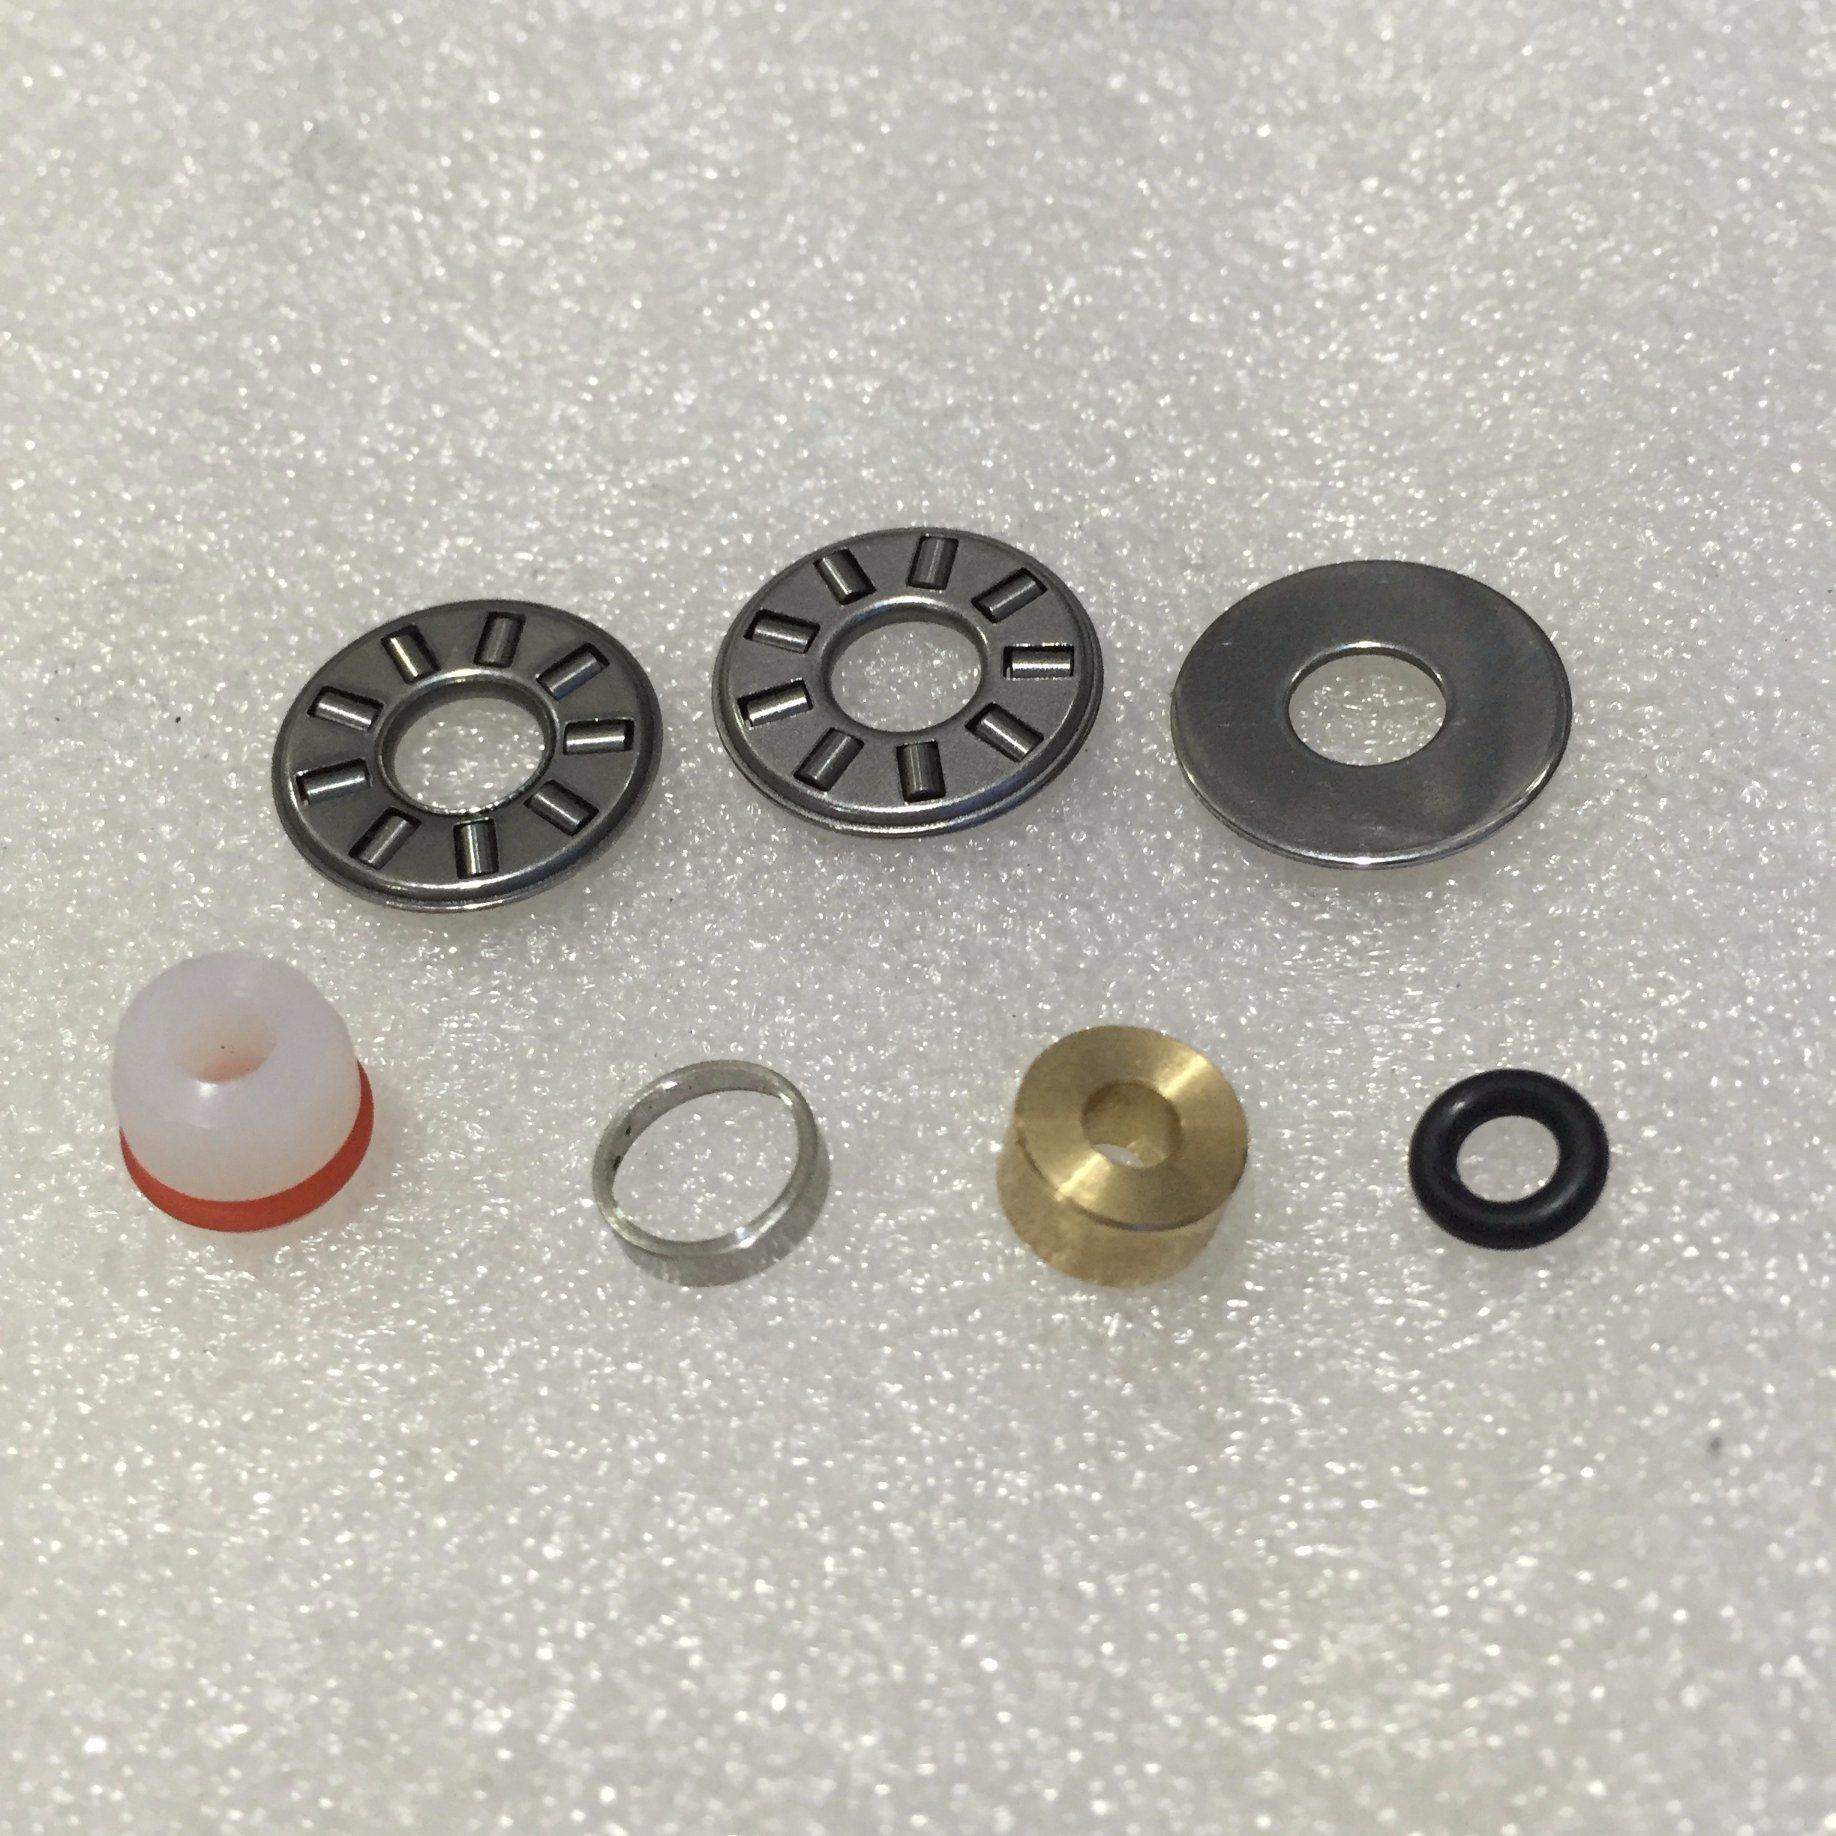 Hot Sale Rotary Valve Repair Kit for Water Jet Cutting Machine